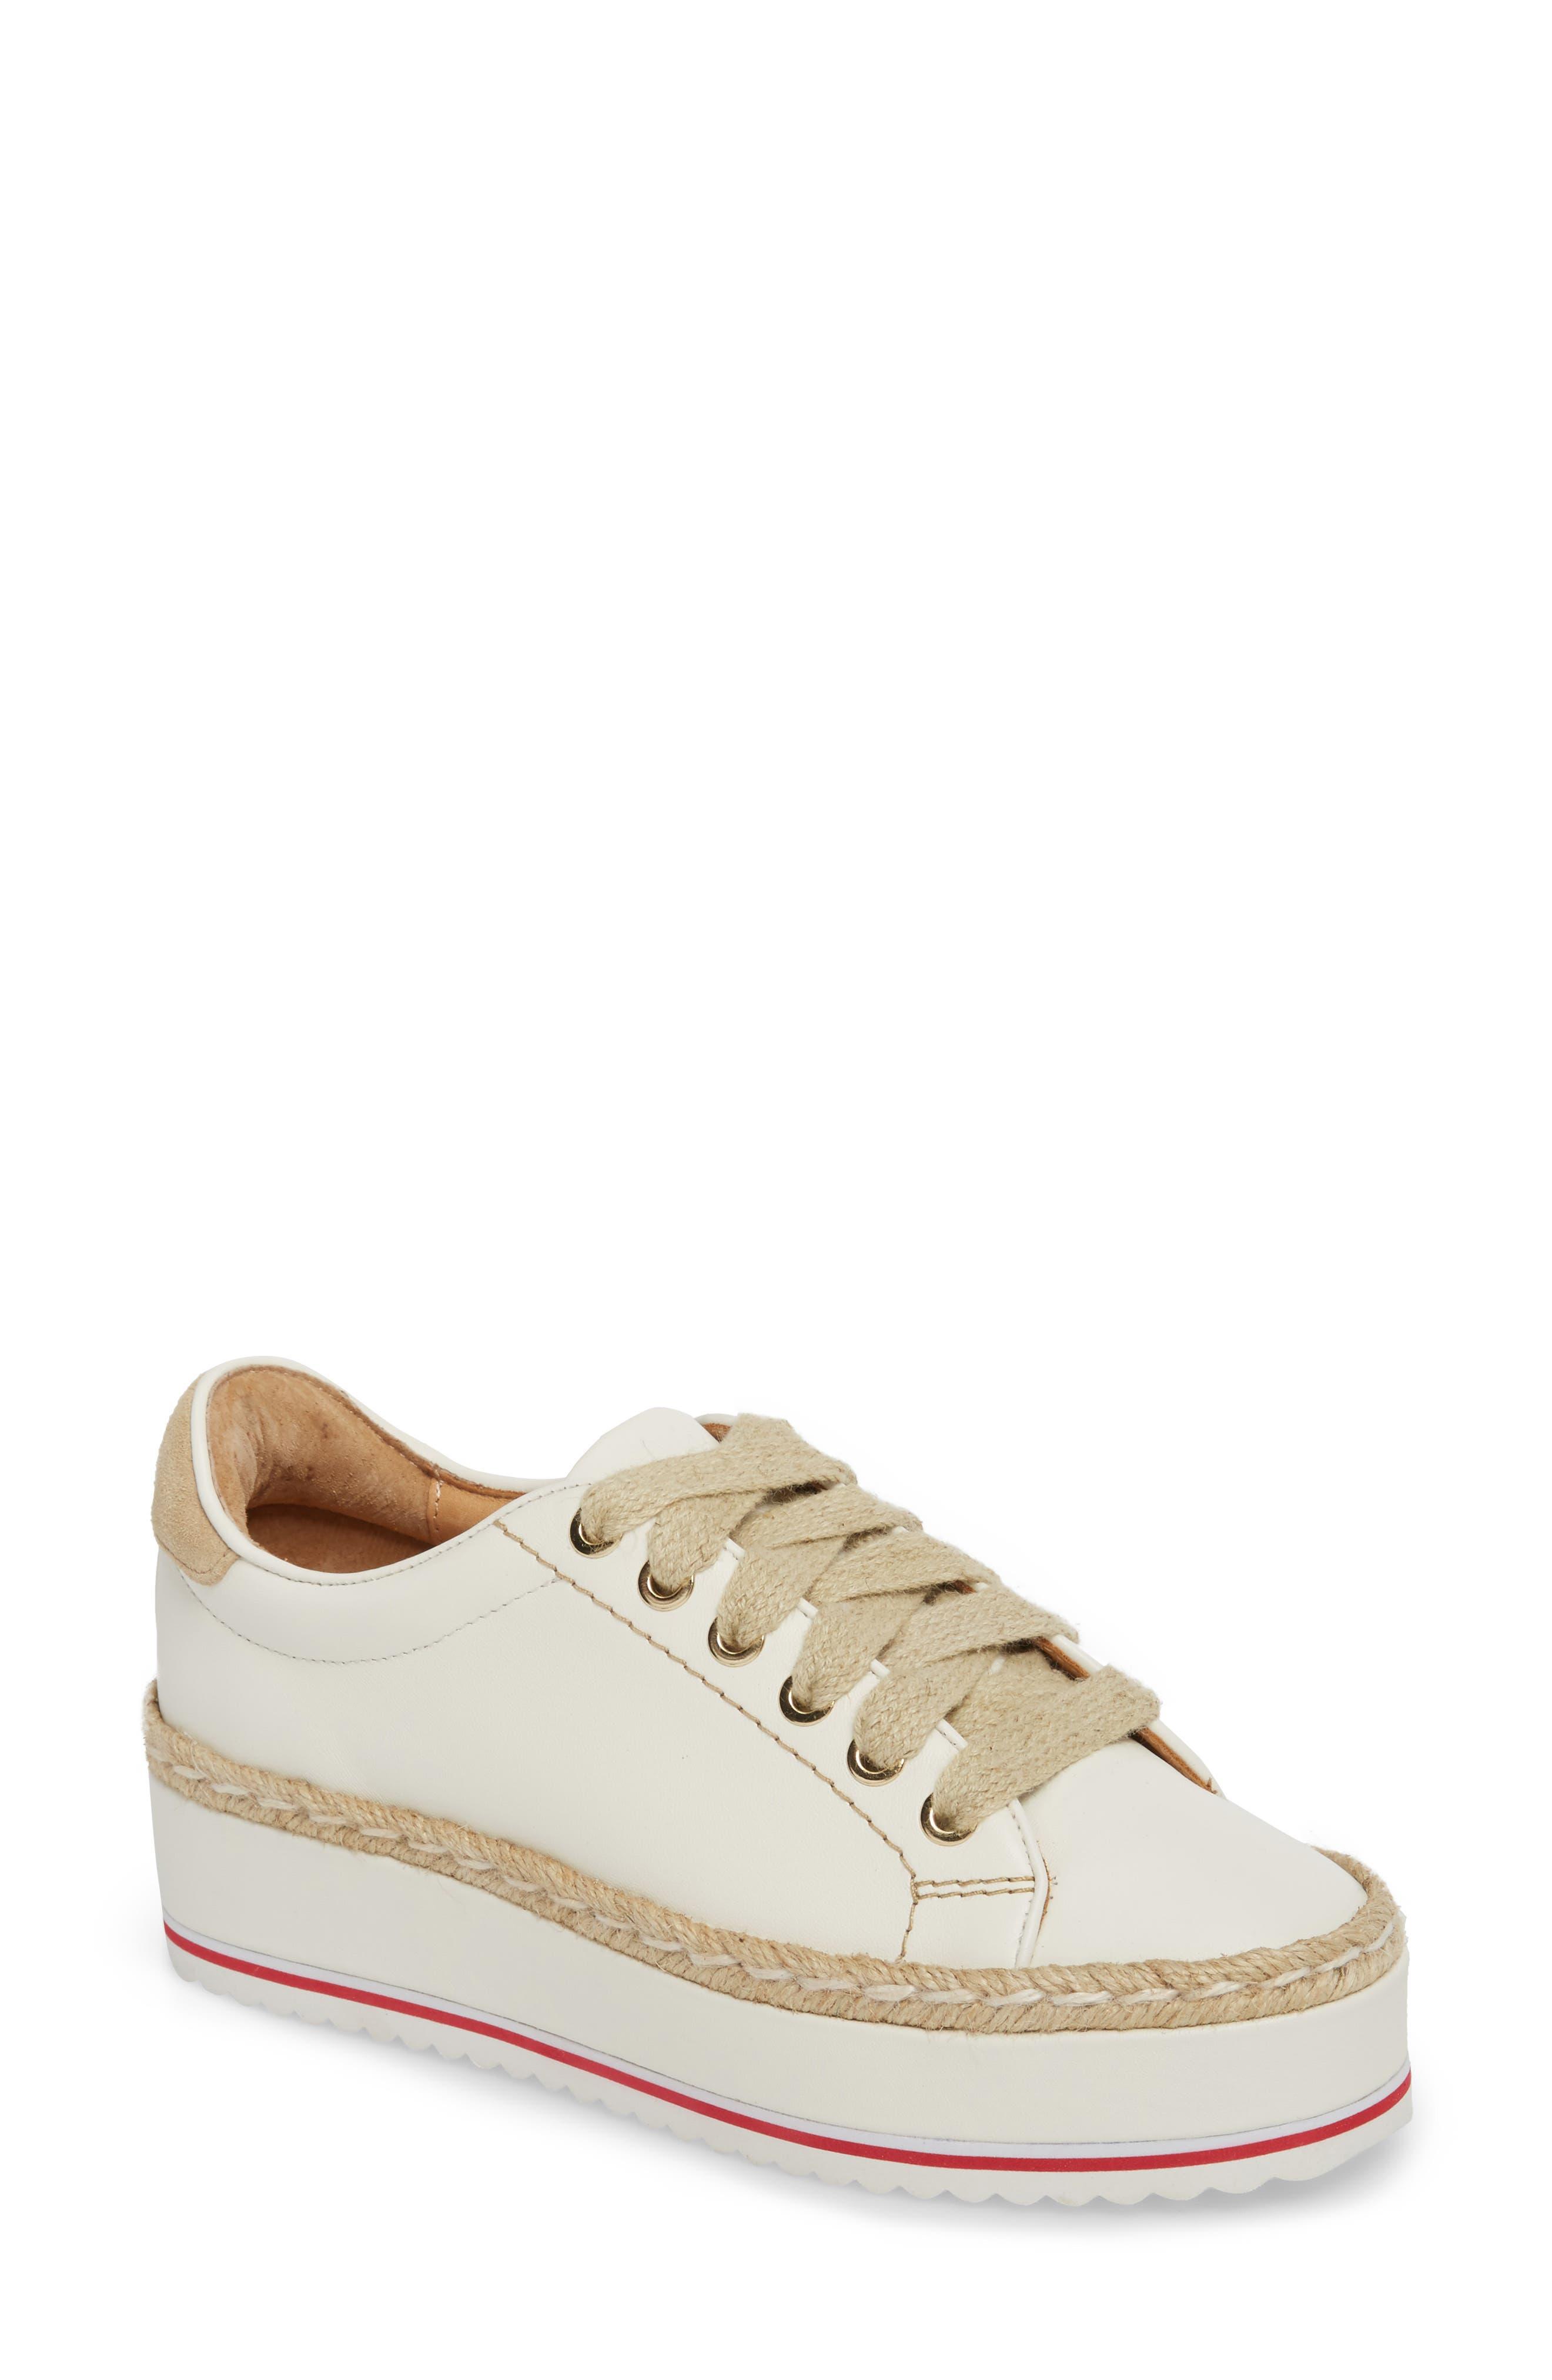 Main Image - Joie Dabnis Espadrille Platform Sneaker (Women)